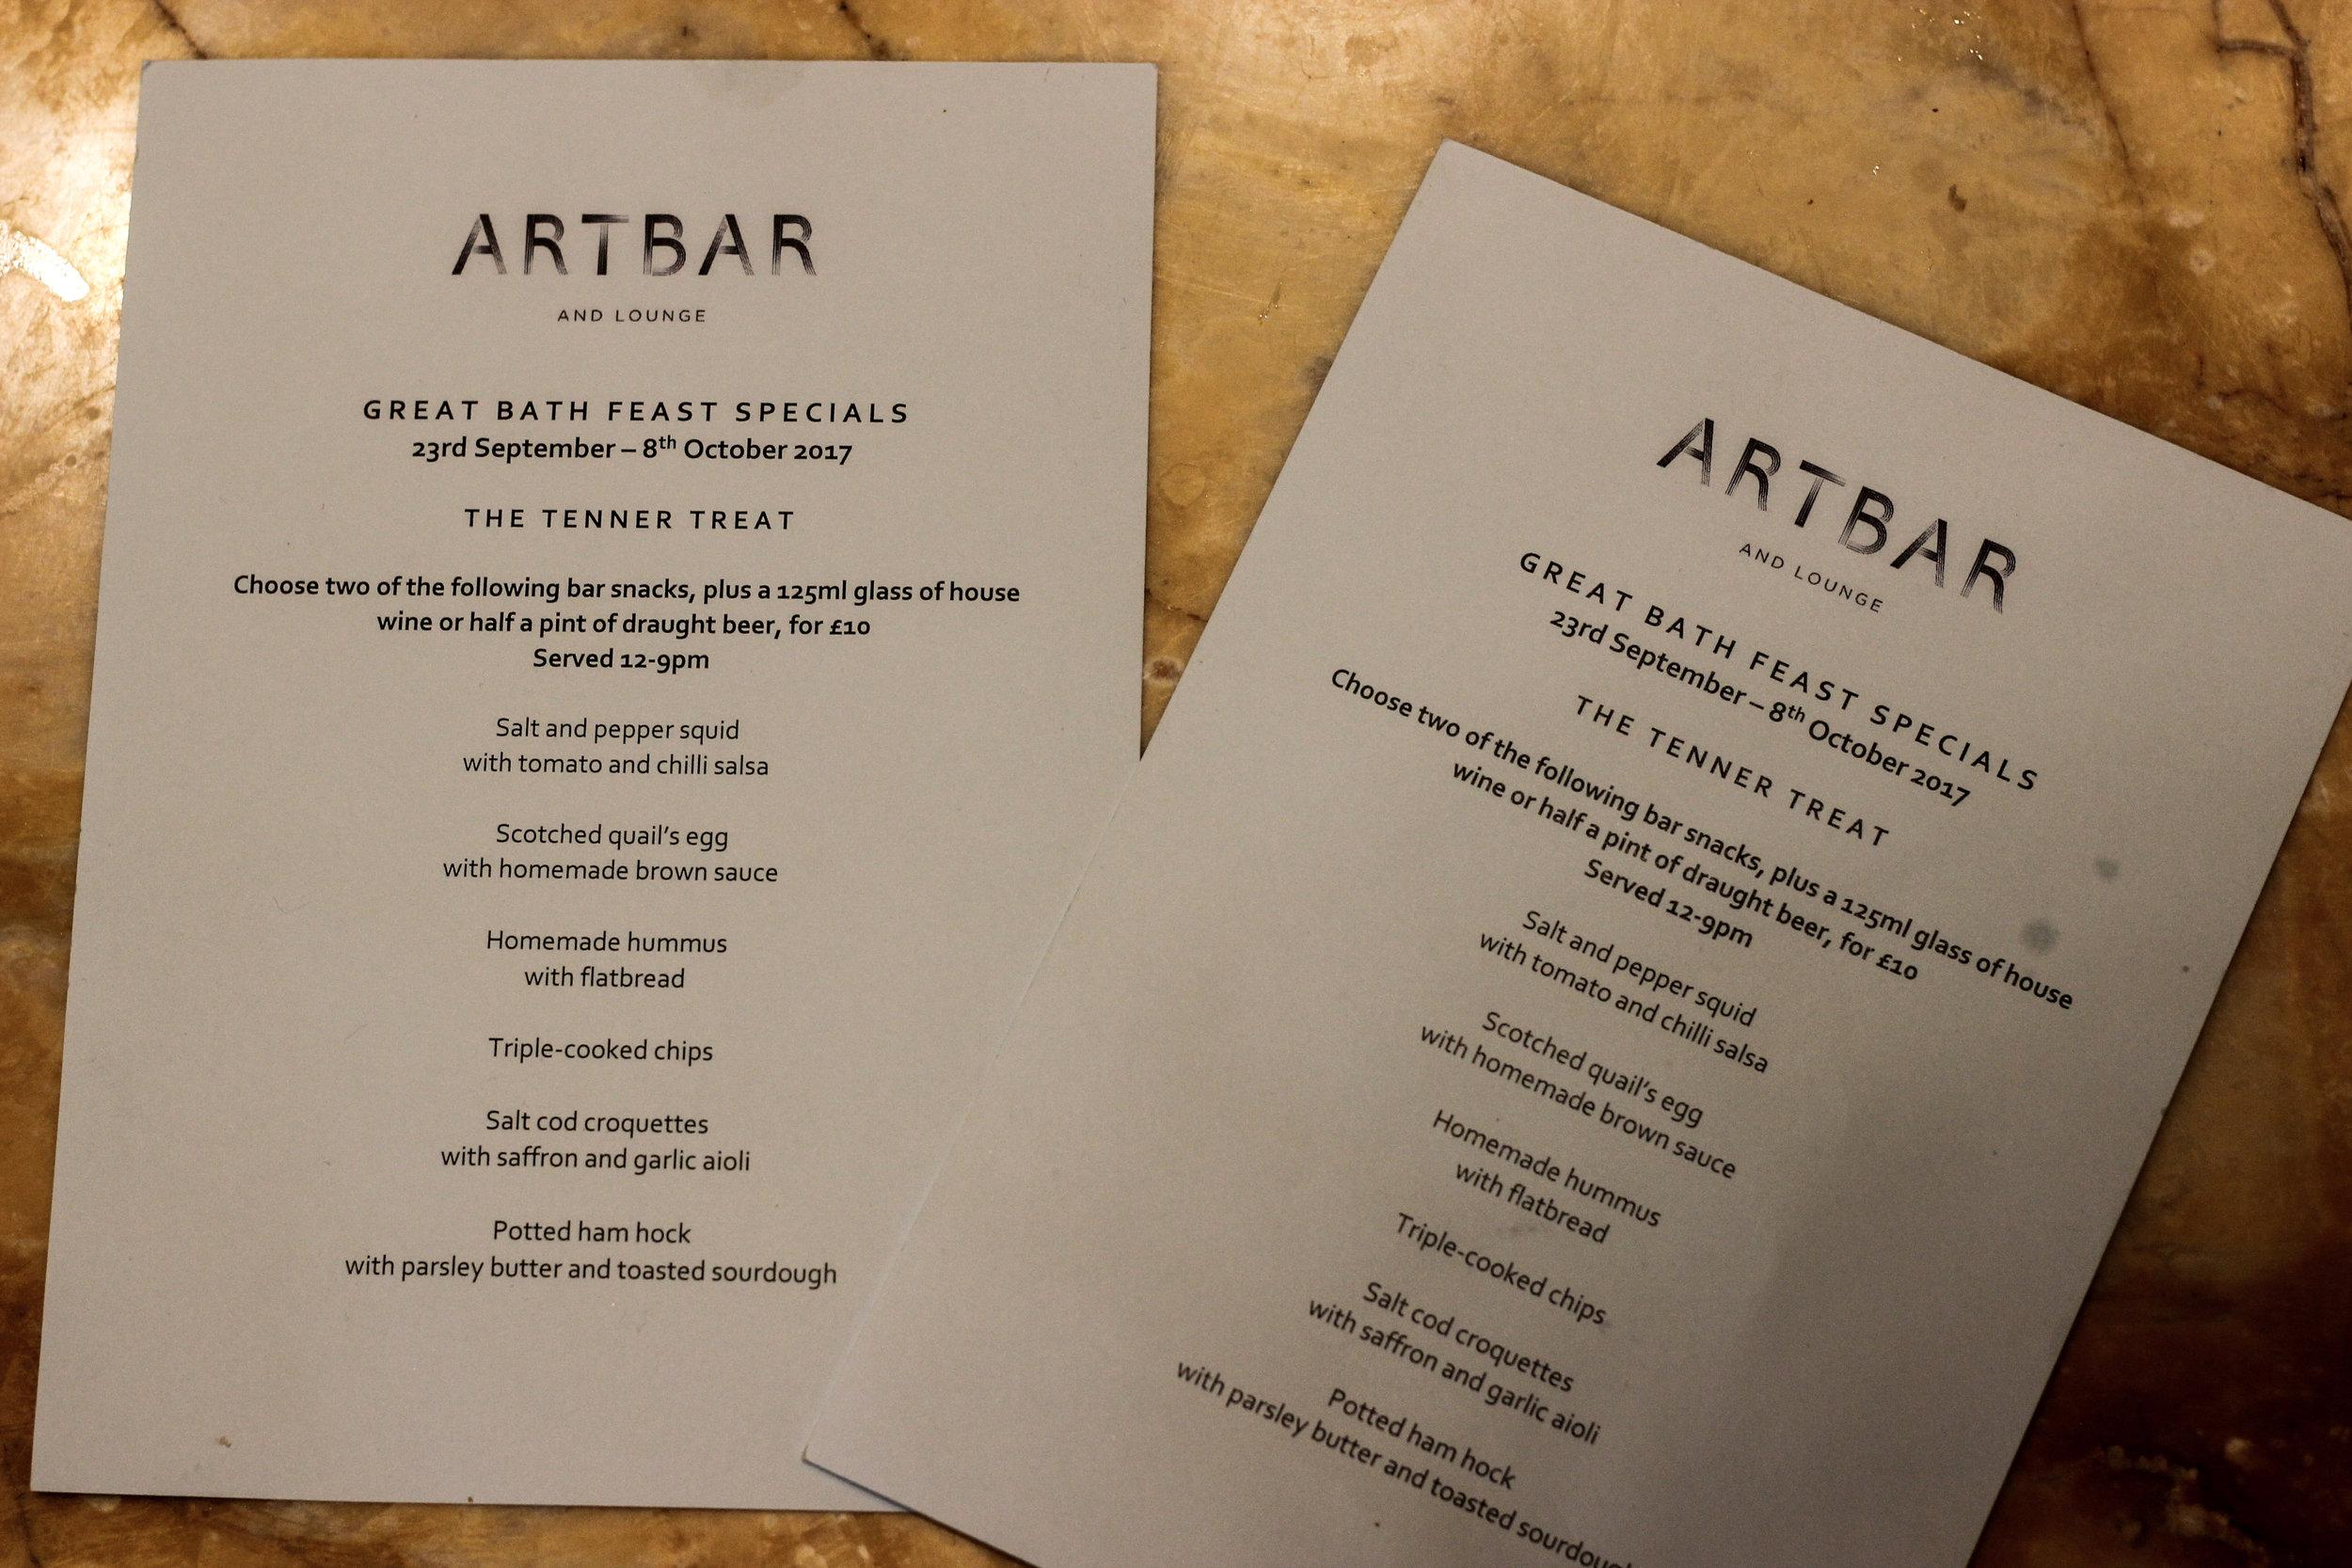 ArtBar The Abbey Hotel The Great Bath Feast Restaurant Review